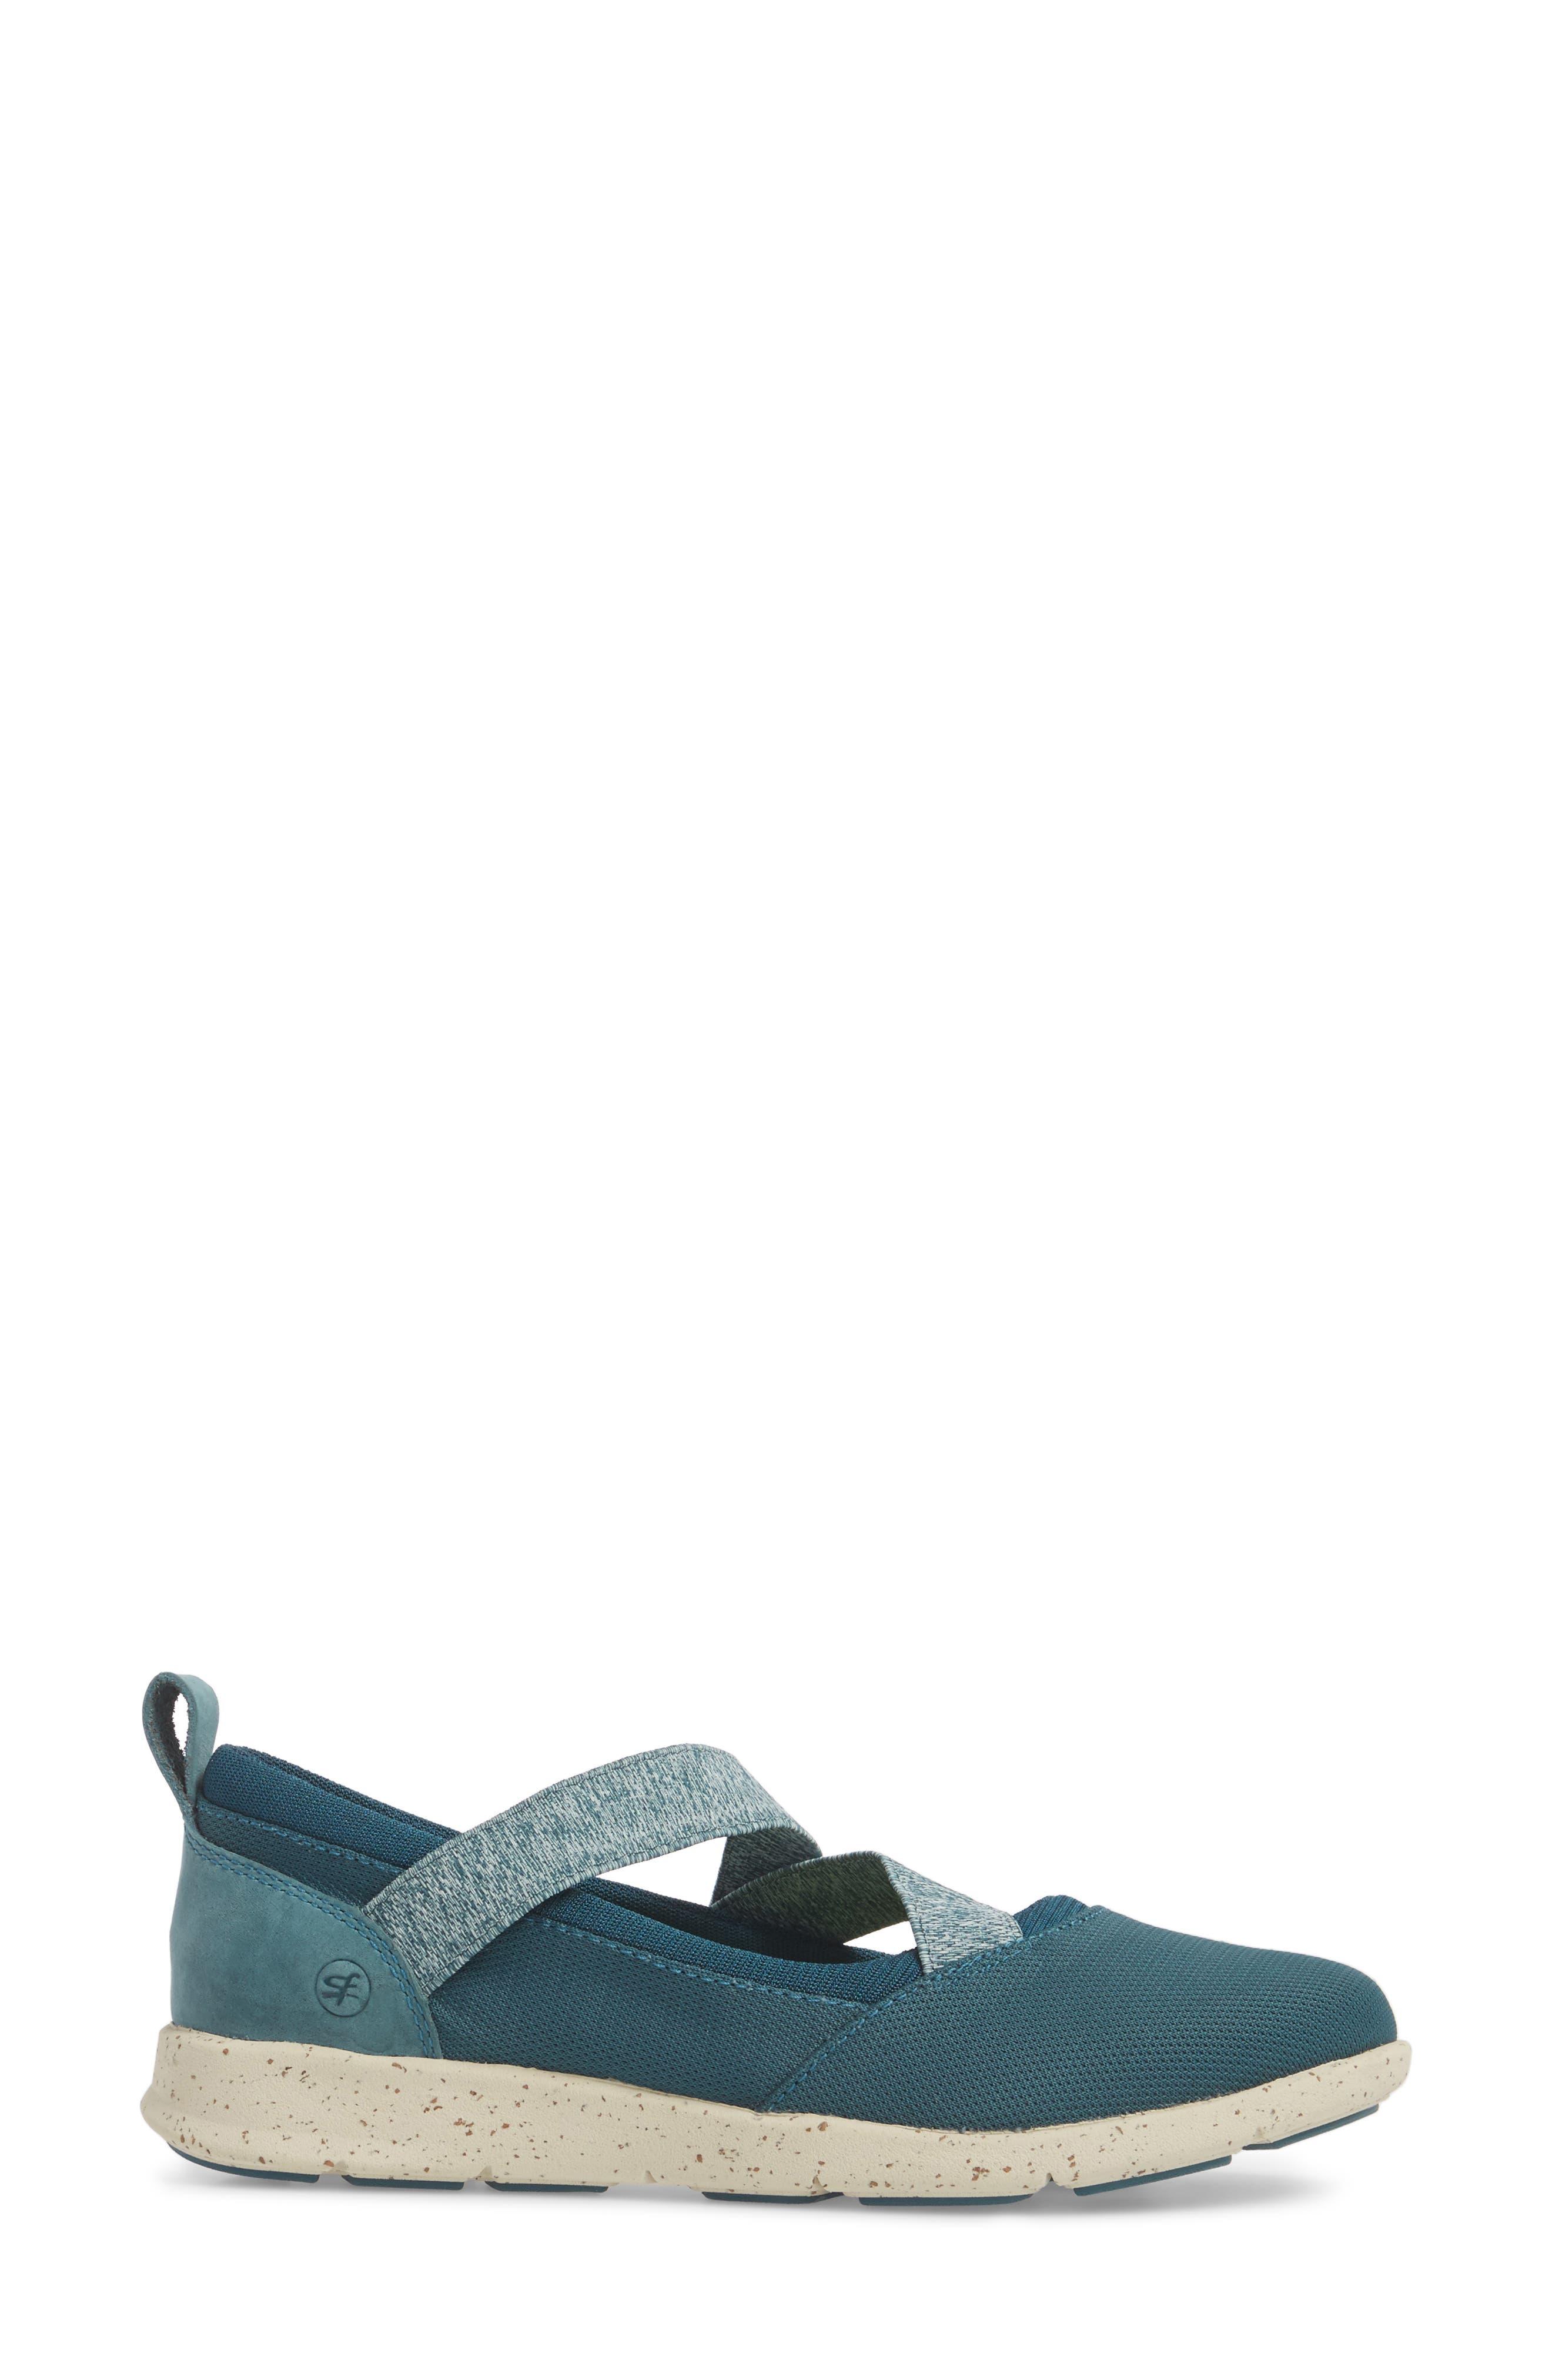 Palisade Sneaker,                             Alternate thumbnail 3, color,                             Balsam Blue Leather